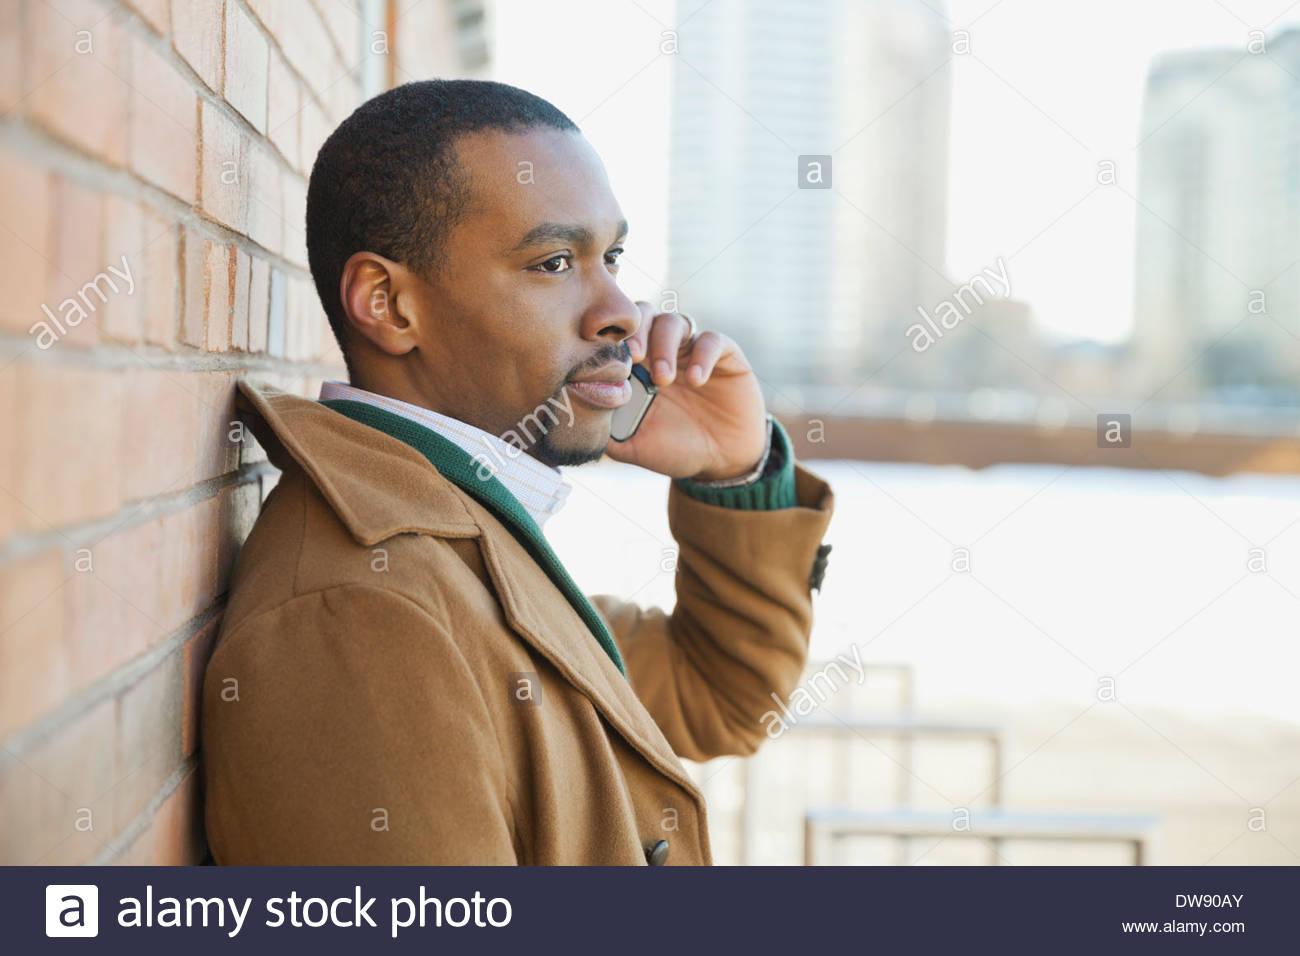 Man using smart phone outdoors - Stock Image